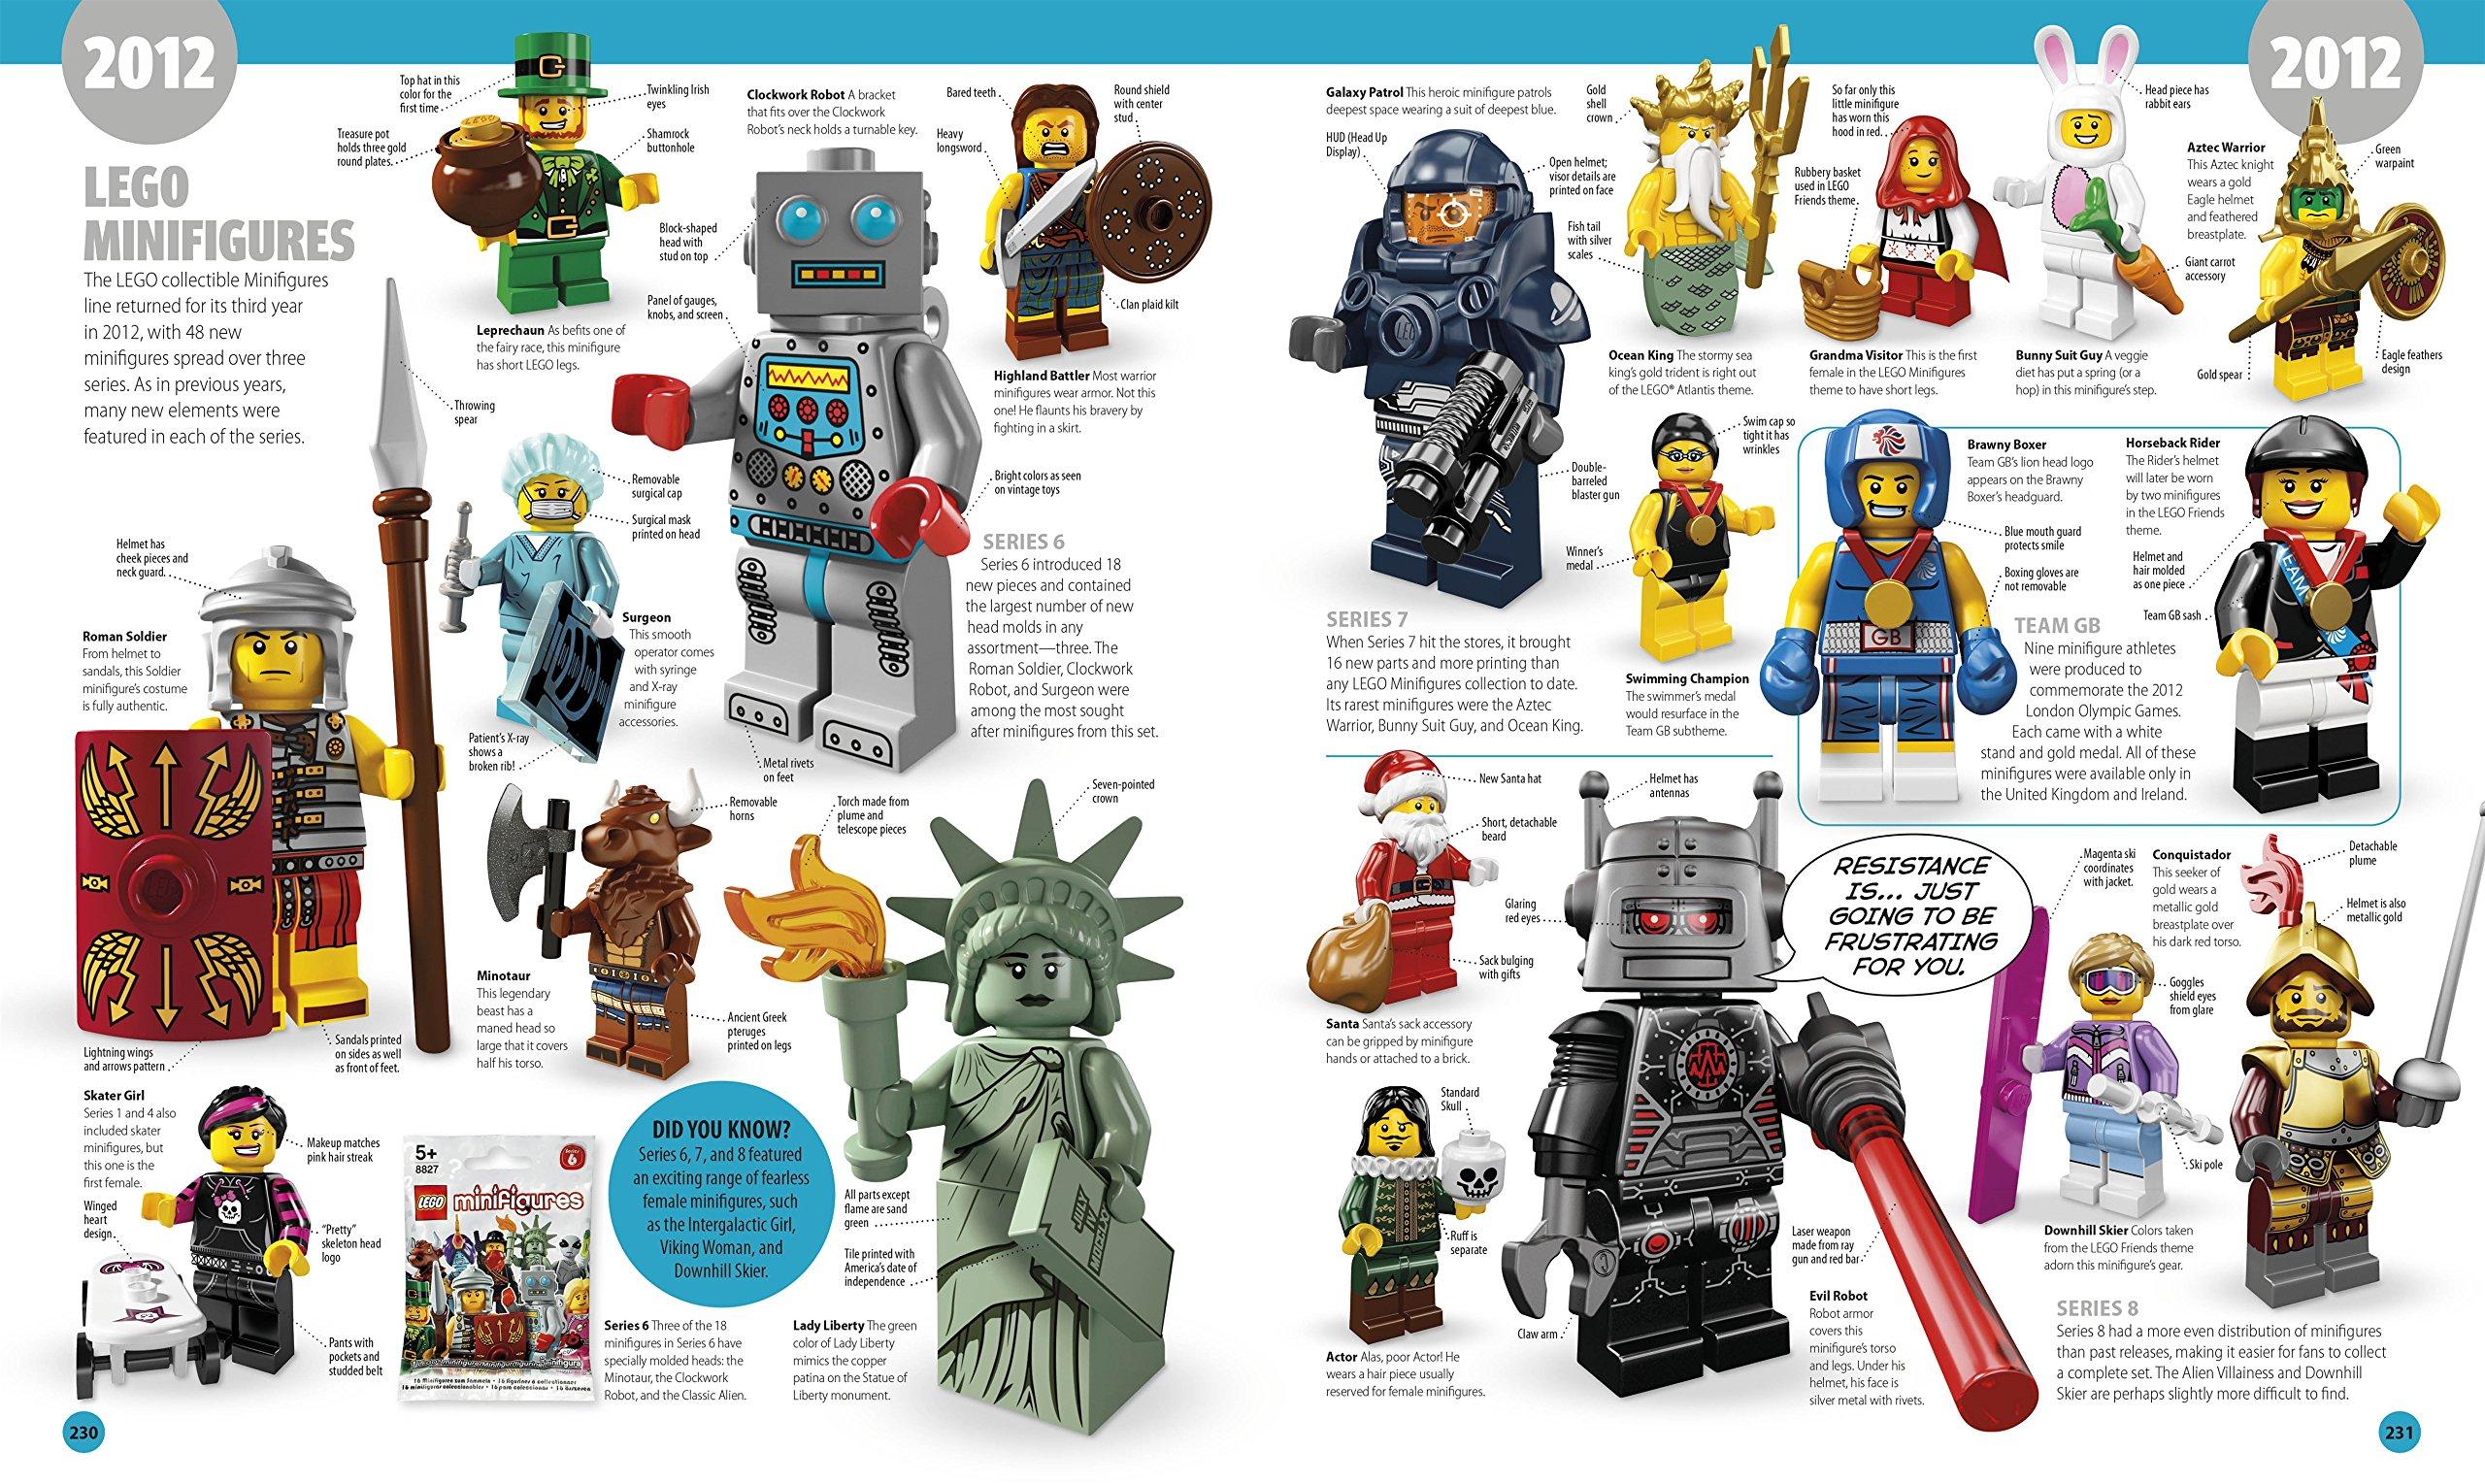 LEGO® Minifigure Year by Year A Visual History: With 3 Minifigures Dk Lego: Amazon.es: DK, Gregory Farshtey, Daniel Lipkowitz: Libros en idiomas extranjeros